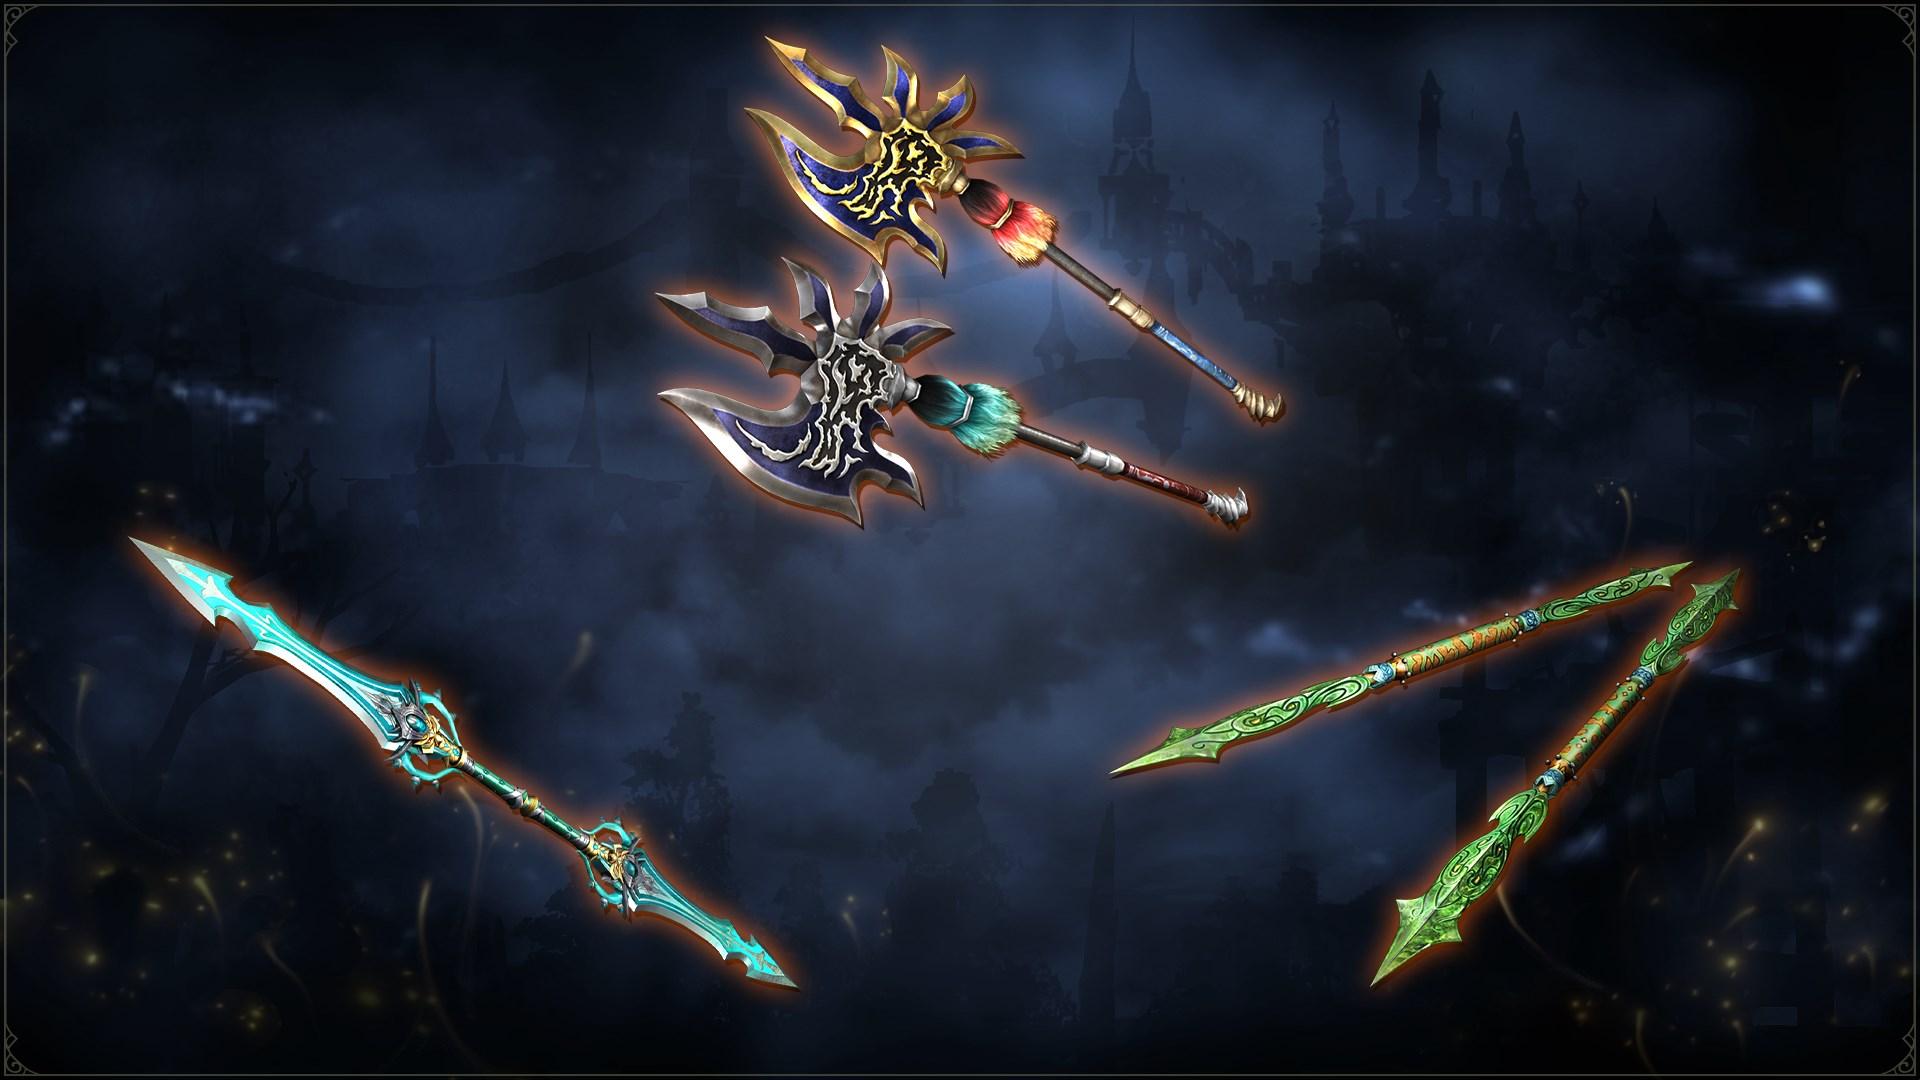 WARRIORS OROCHI 4: Legendary Weapons Wei Pack 2